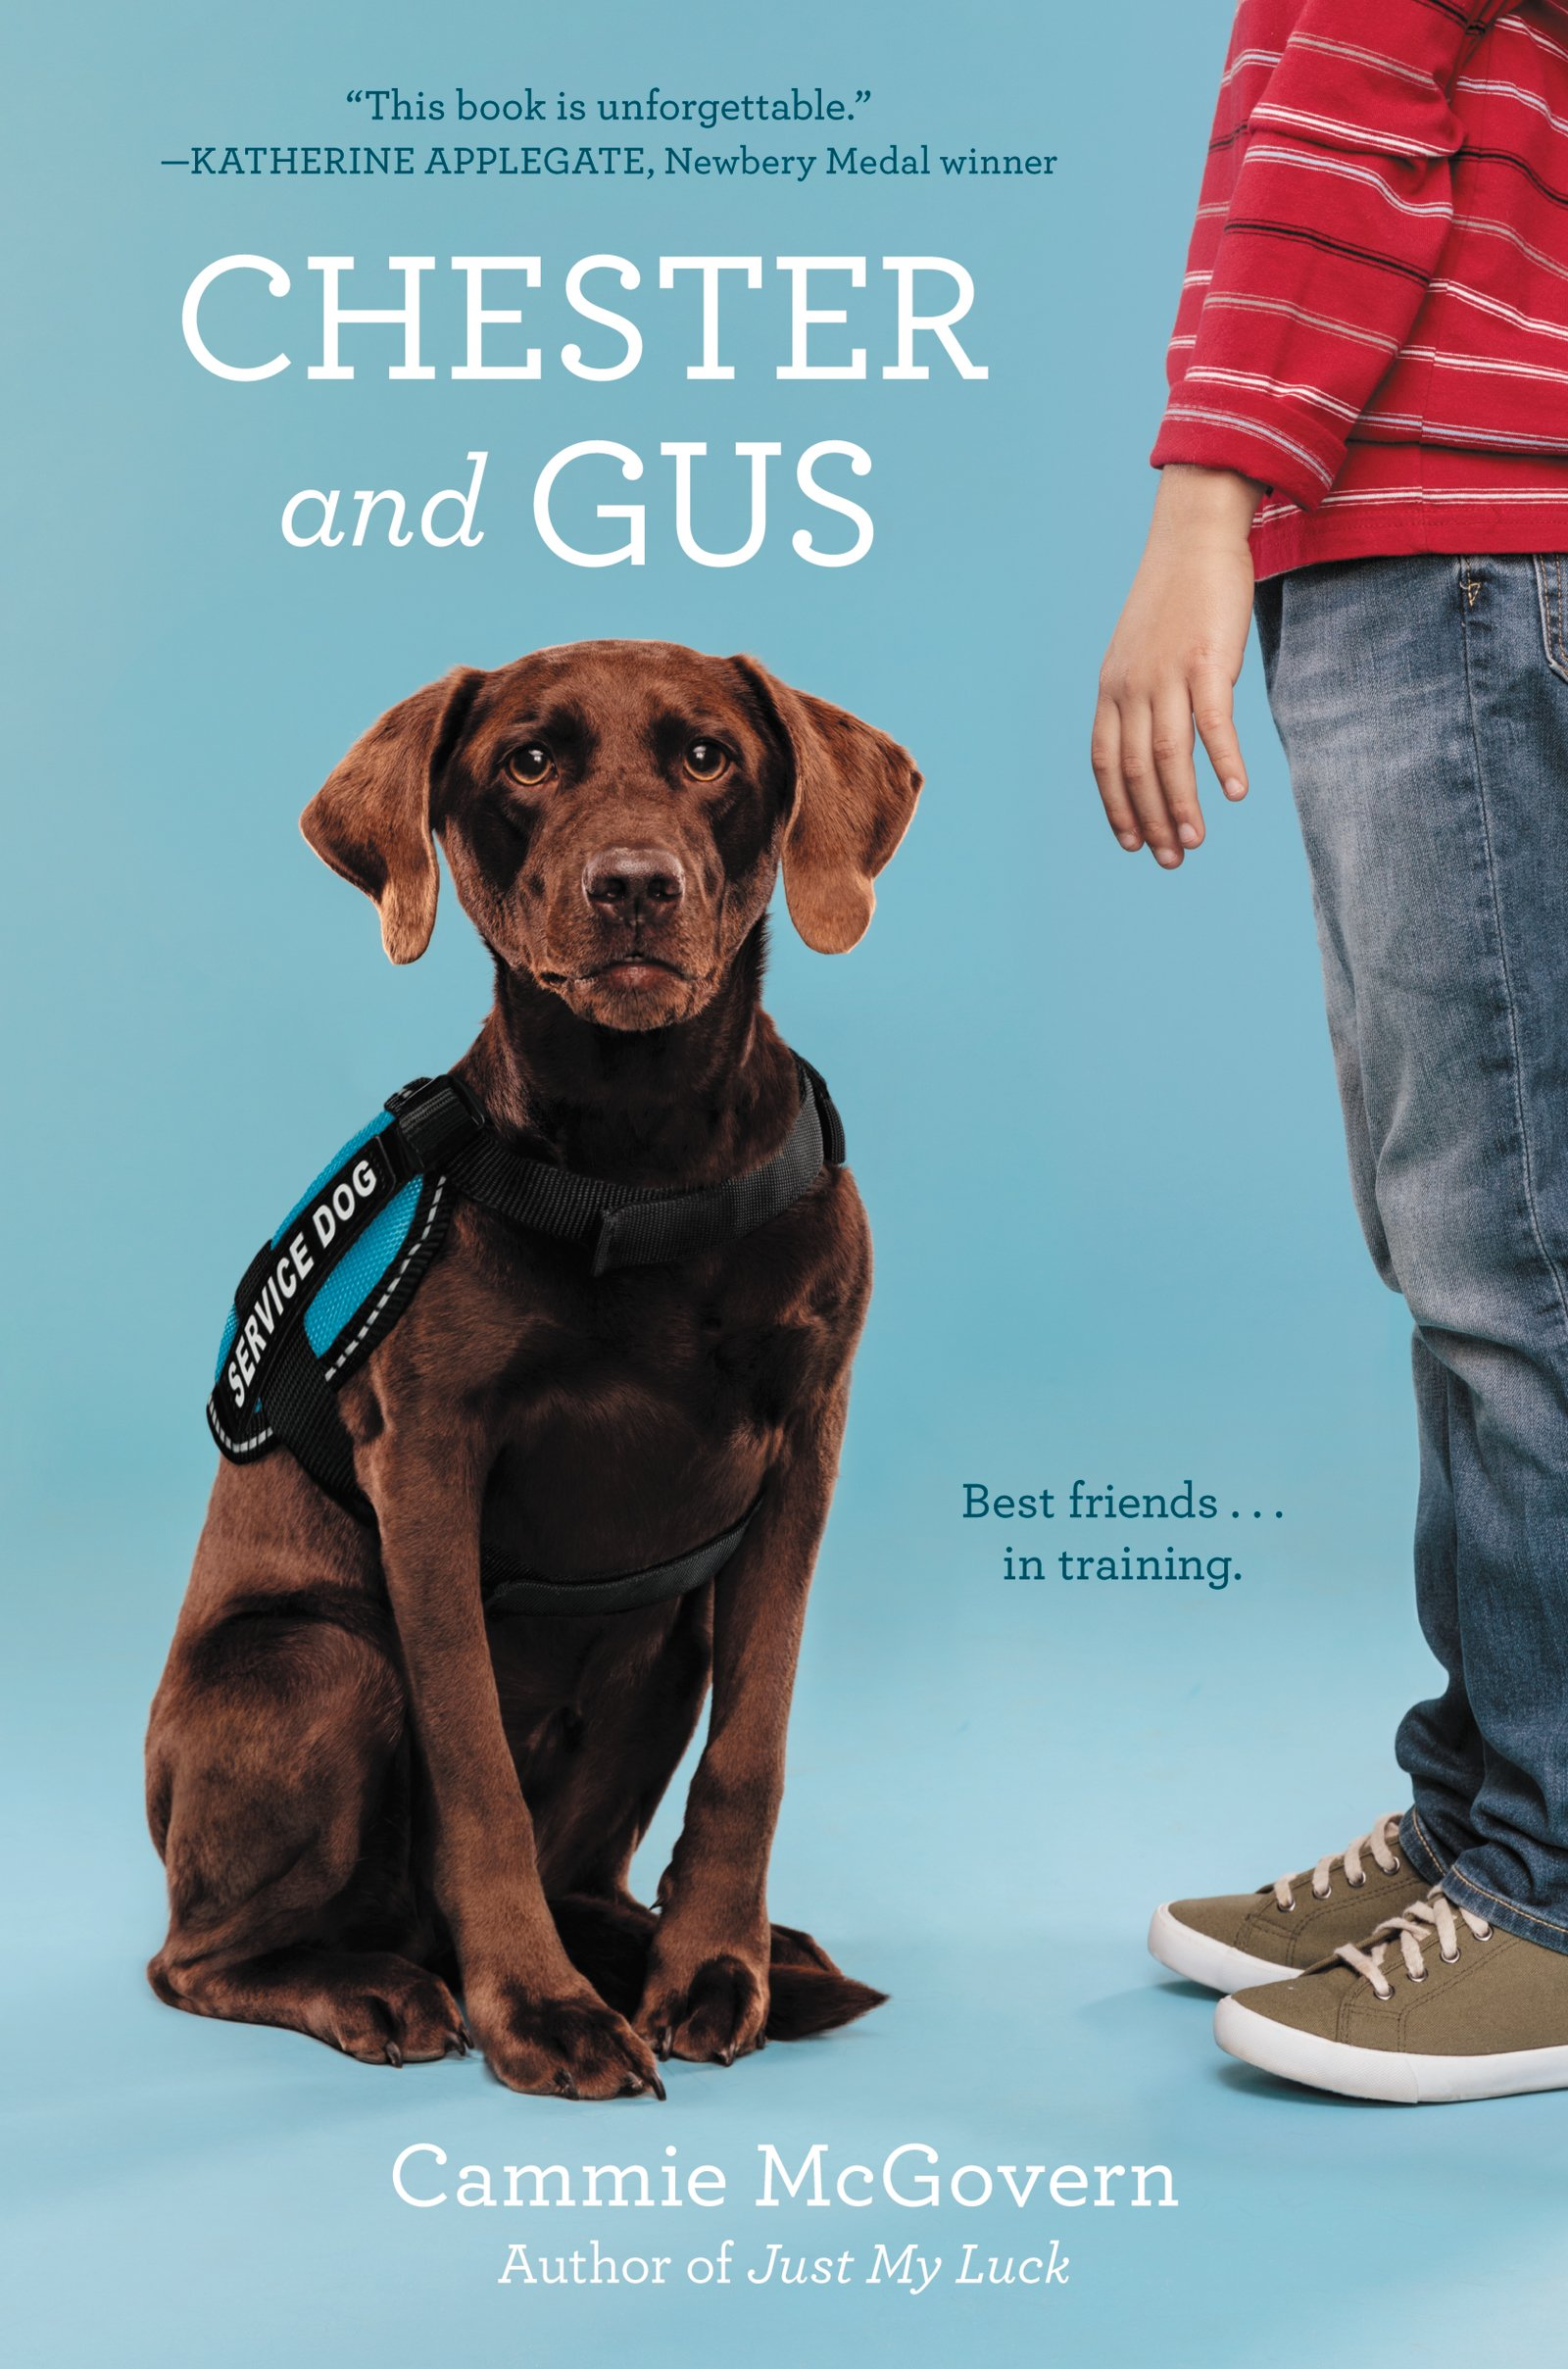 USA book cover